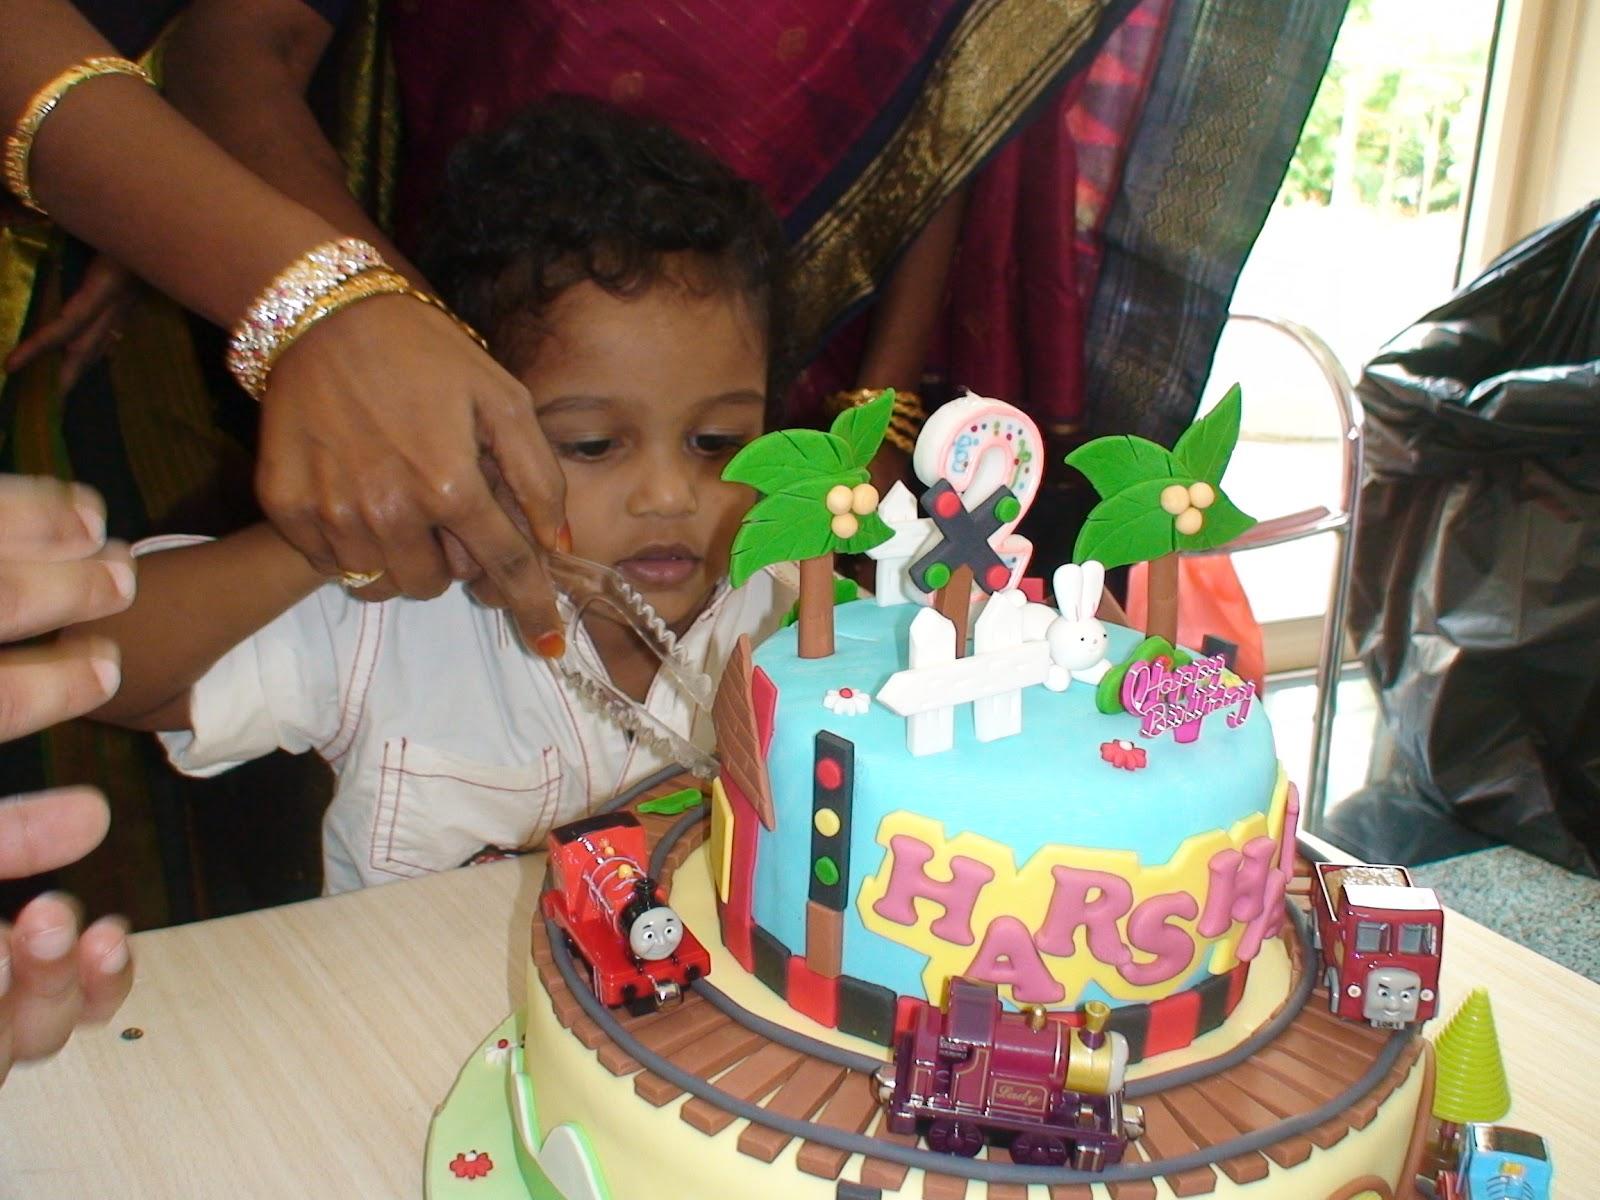 Cake Images Kartik : Cakes2Share Singapore: THOMAS AND TRAIN 2 TIER CAKE ...